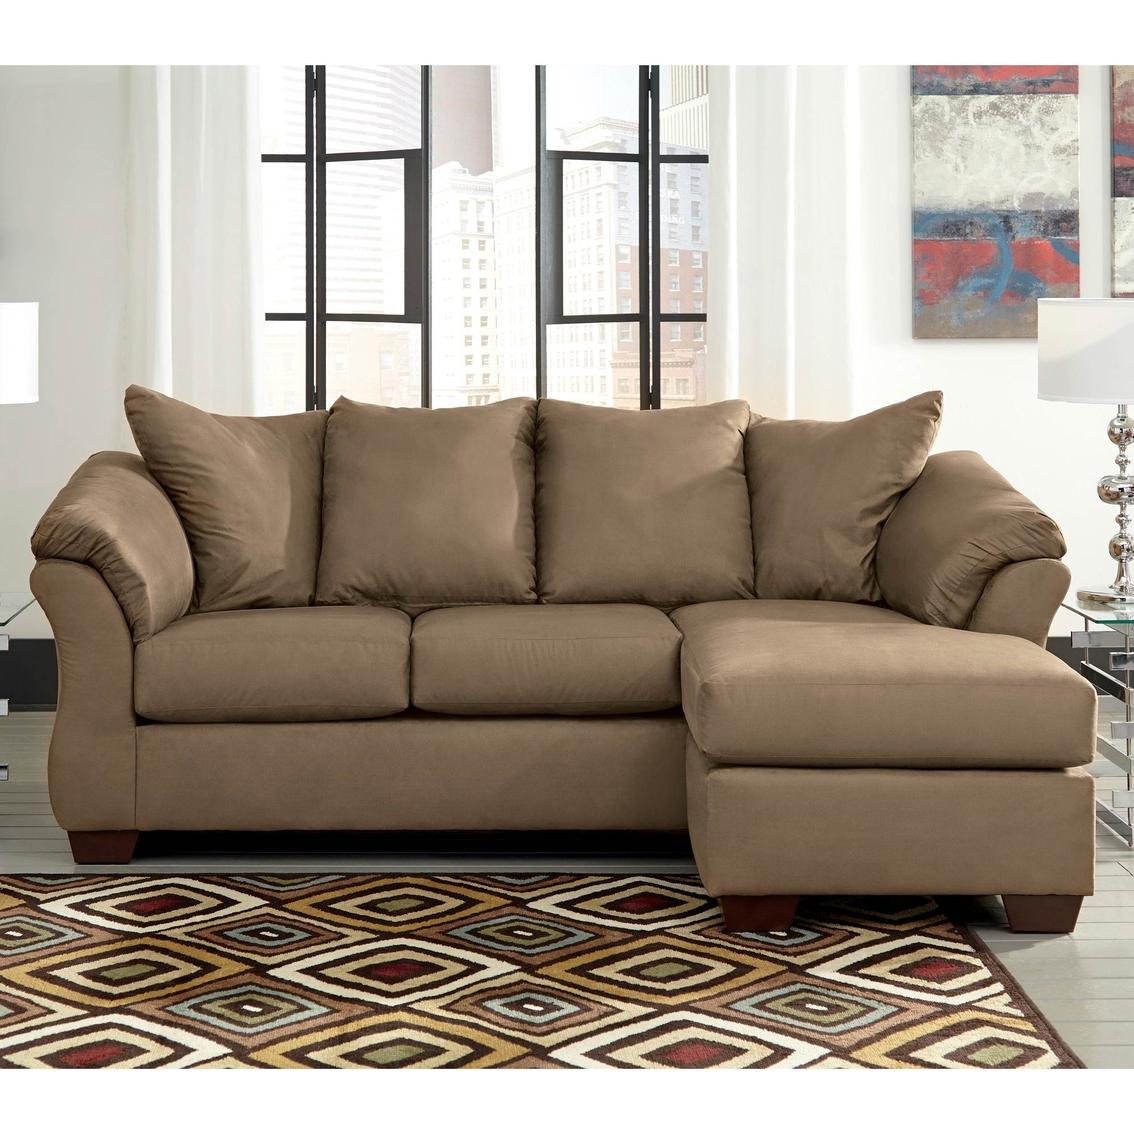 Sectional Sofa In Huntsville Al: Signature Design By Ashley Darcy Sofa Chaise